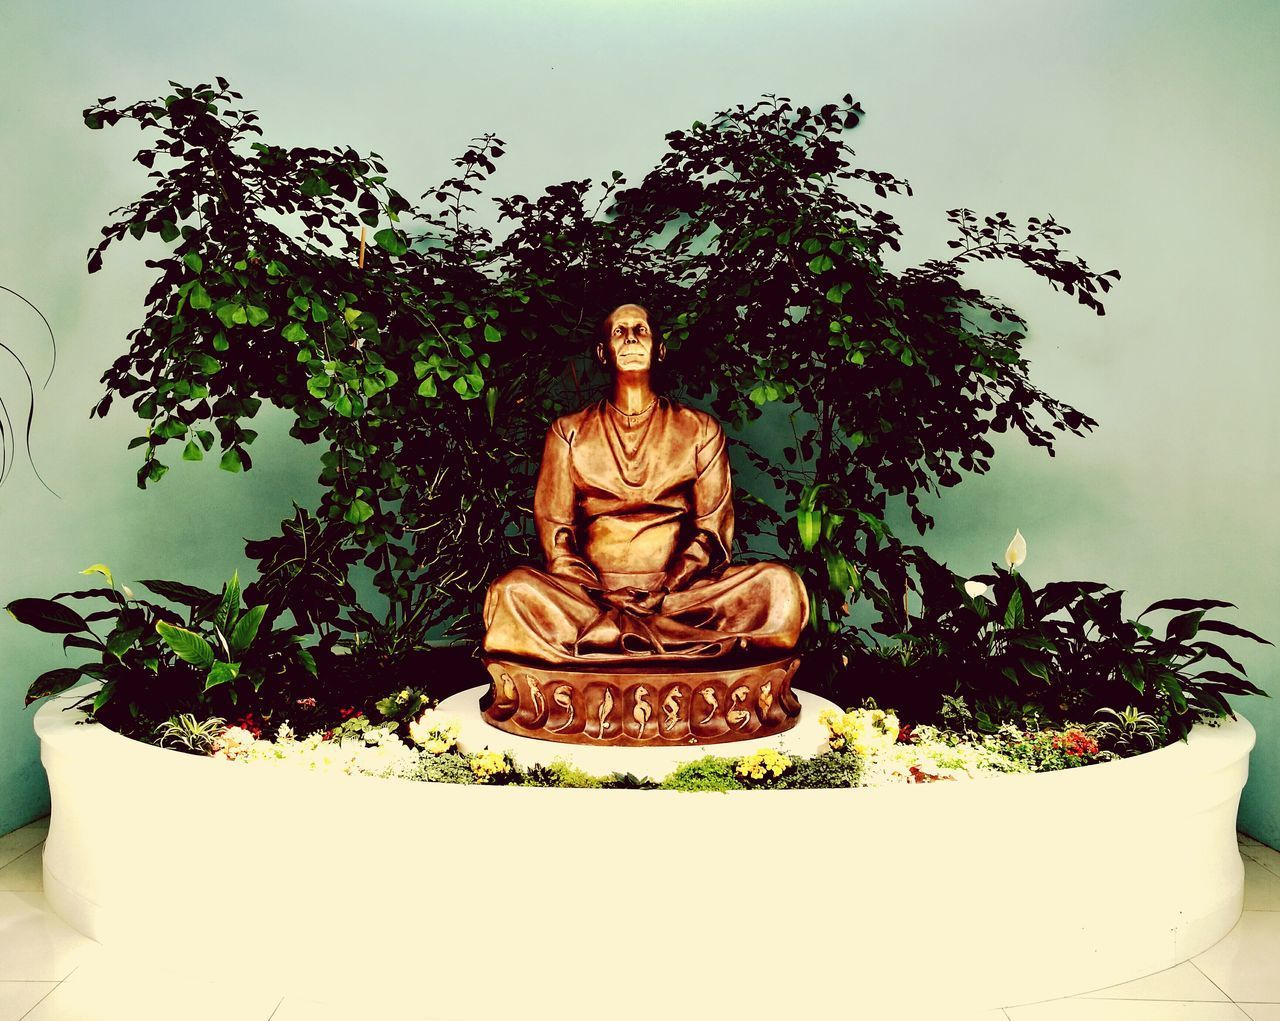 Sri Chinmoy Sri Chinmoy Religion Statue Sculpture Buddhism Buddha Advaita Vedanta Mooji Hinduism Vegan Vegan Food Peace And Quiet